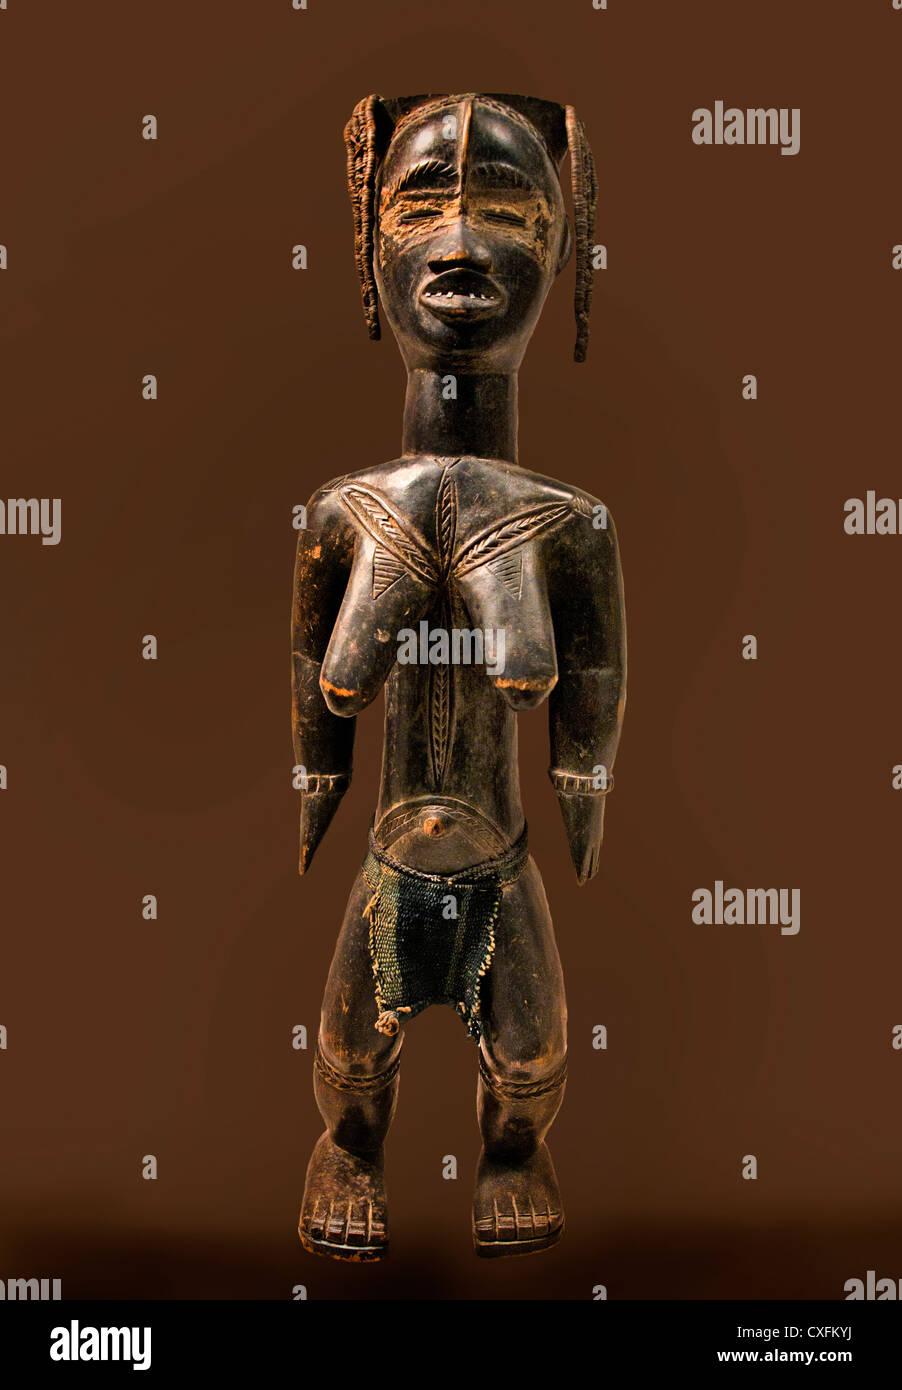 Female Figure Zlan of Belewale  before 1940  Liberia or Côte d'Ivoire Dan peoples 58.4 x 14 cm Africa - Stock Image